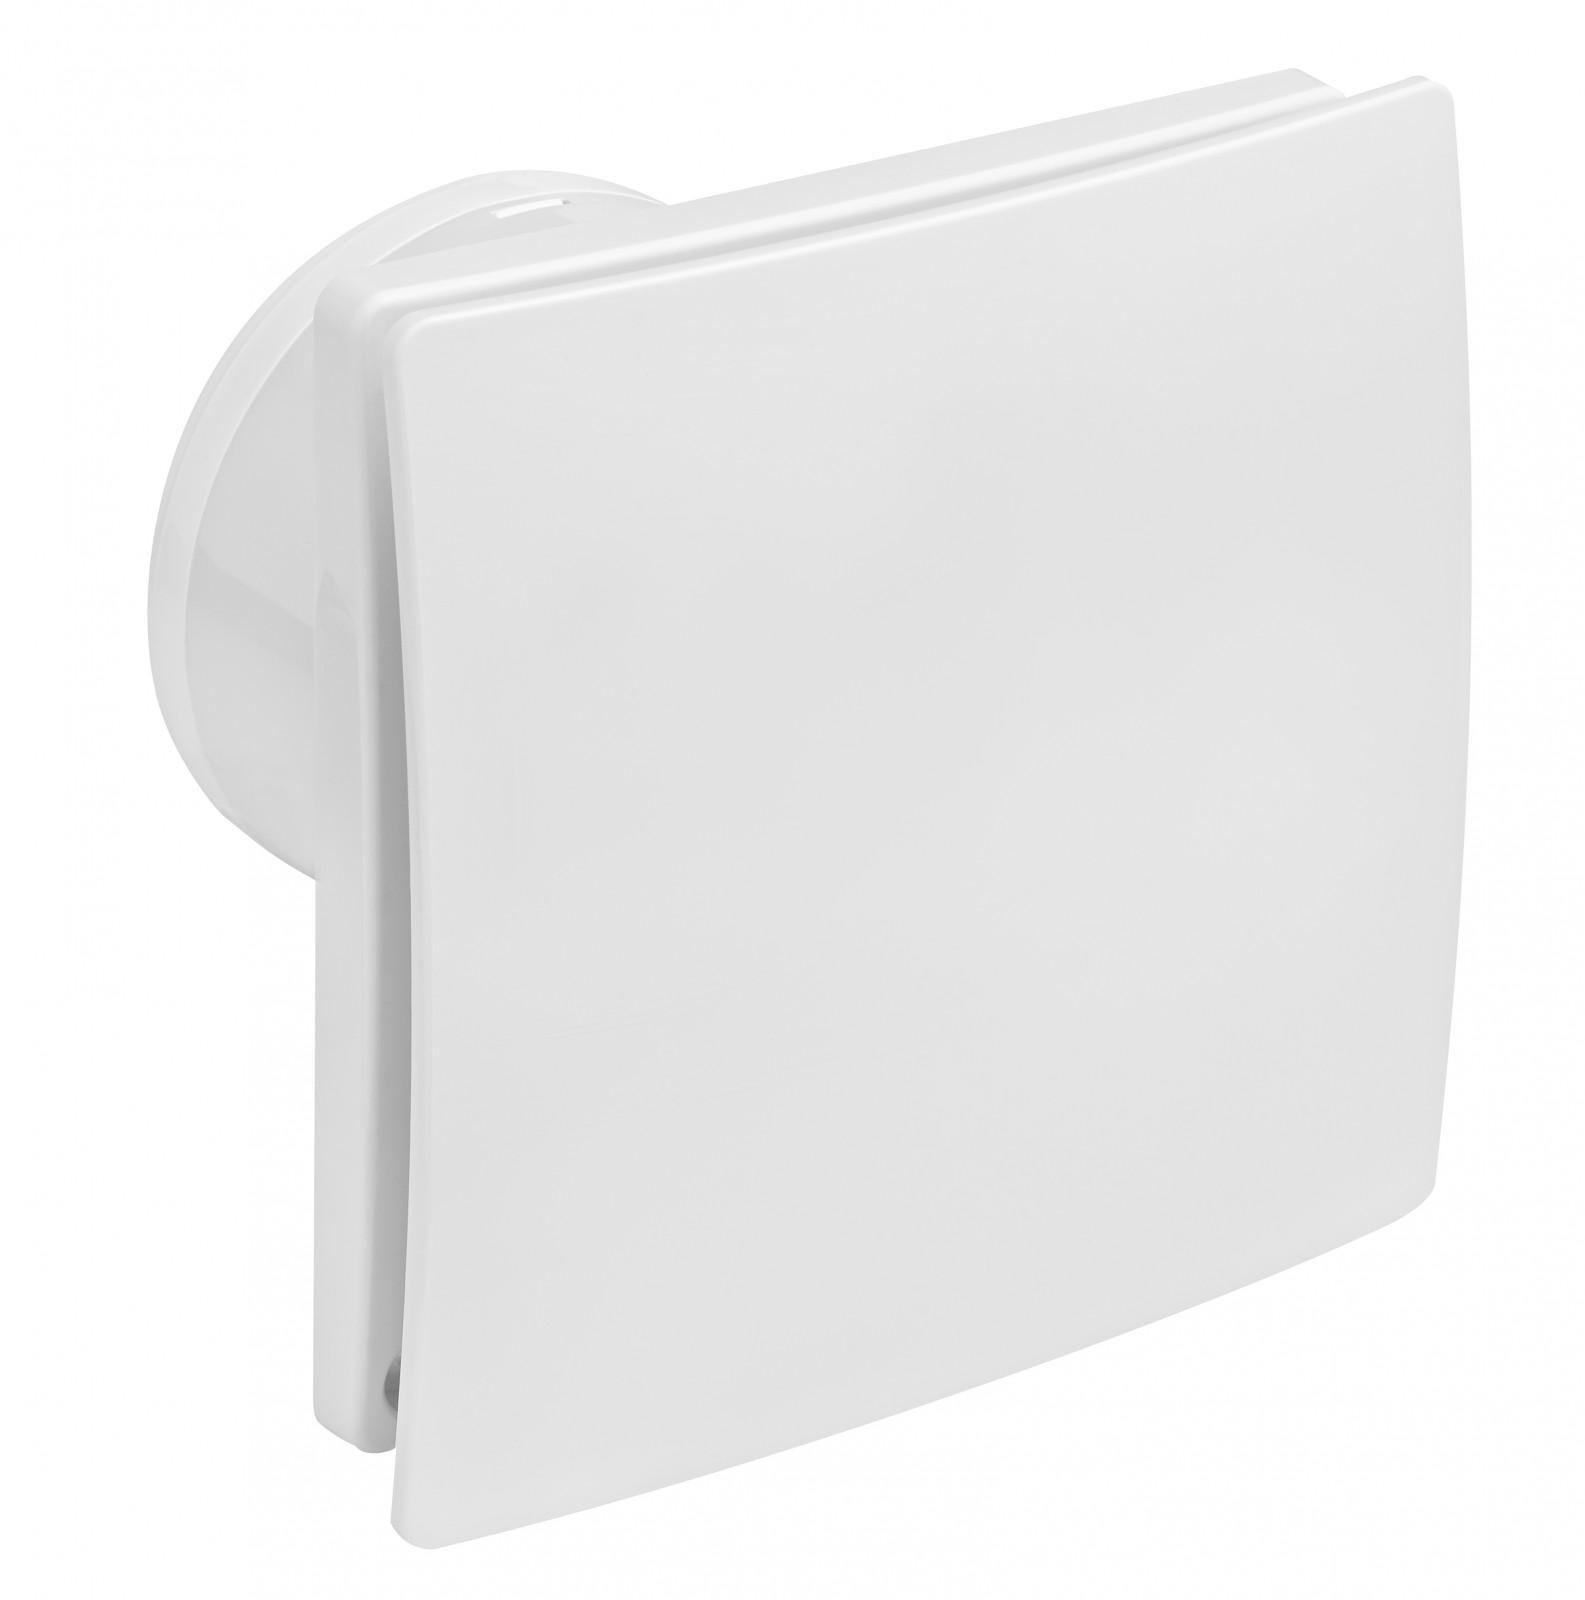 Small Room Fan Bathroom C11 C12 C21 C31 Ip24